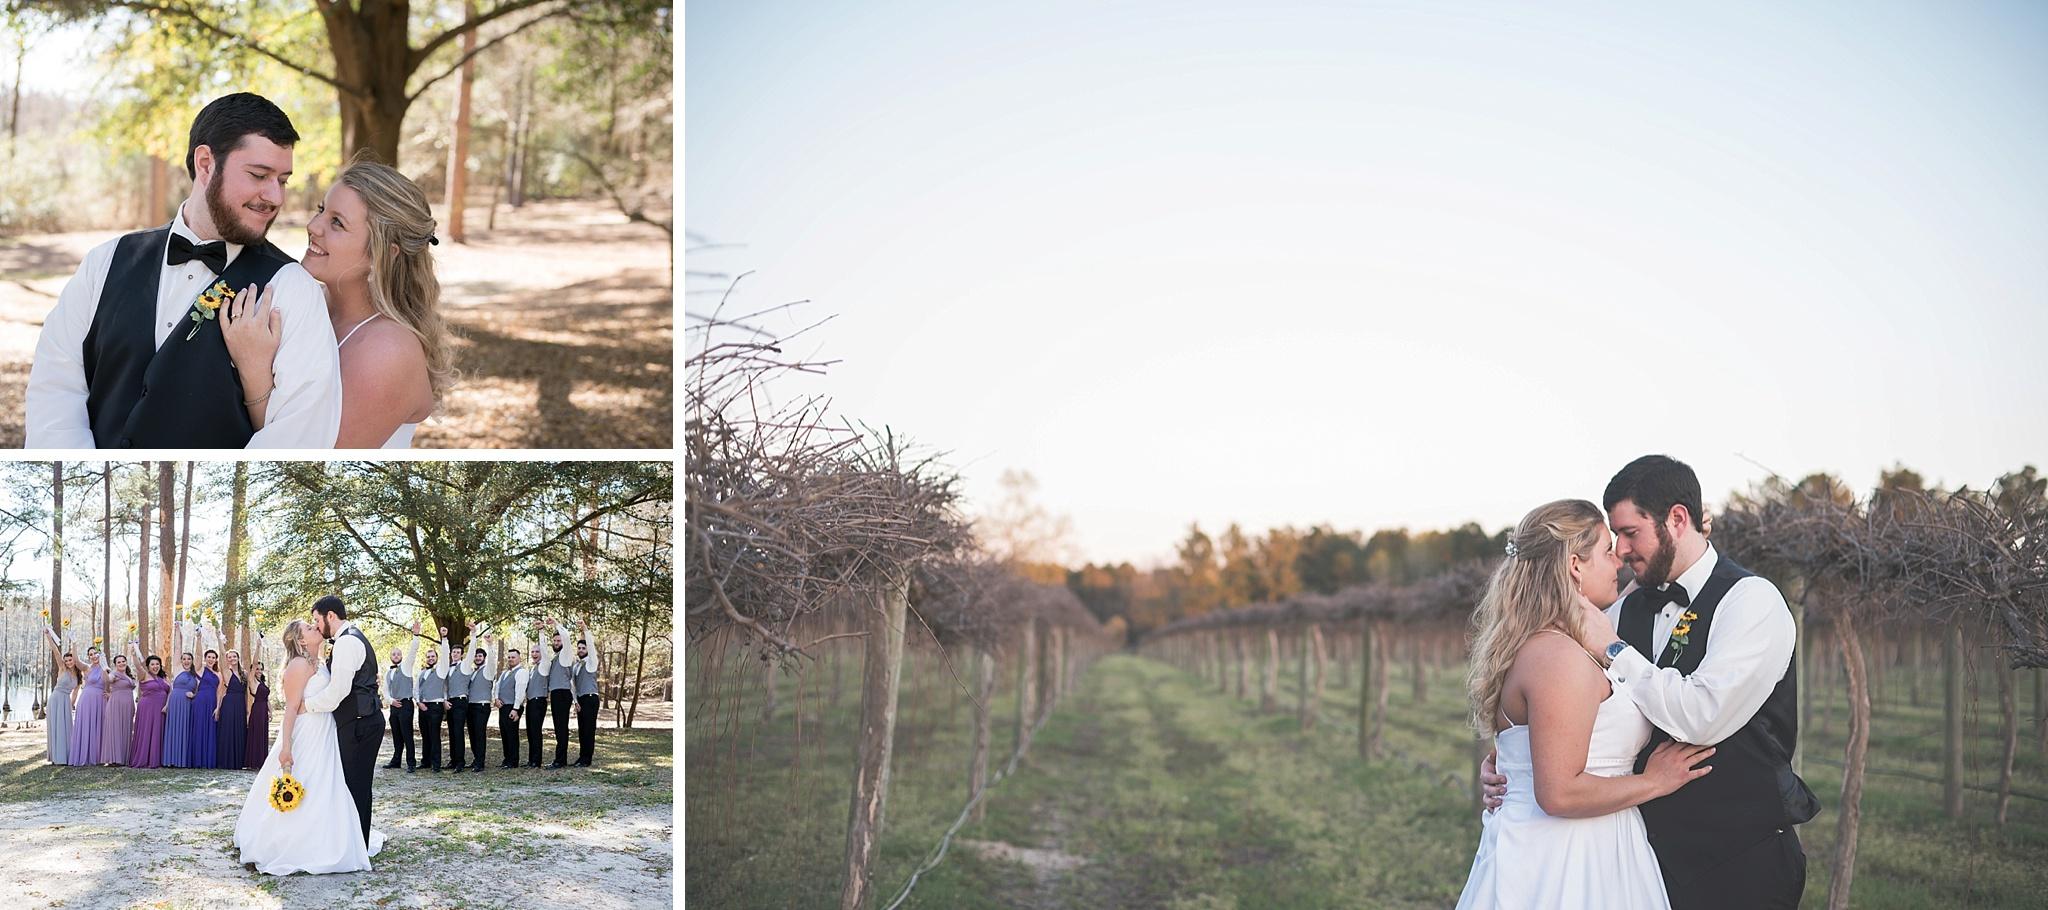 Raleigh-NC-Wedding-Photographers-074.jpg